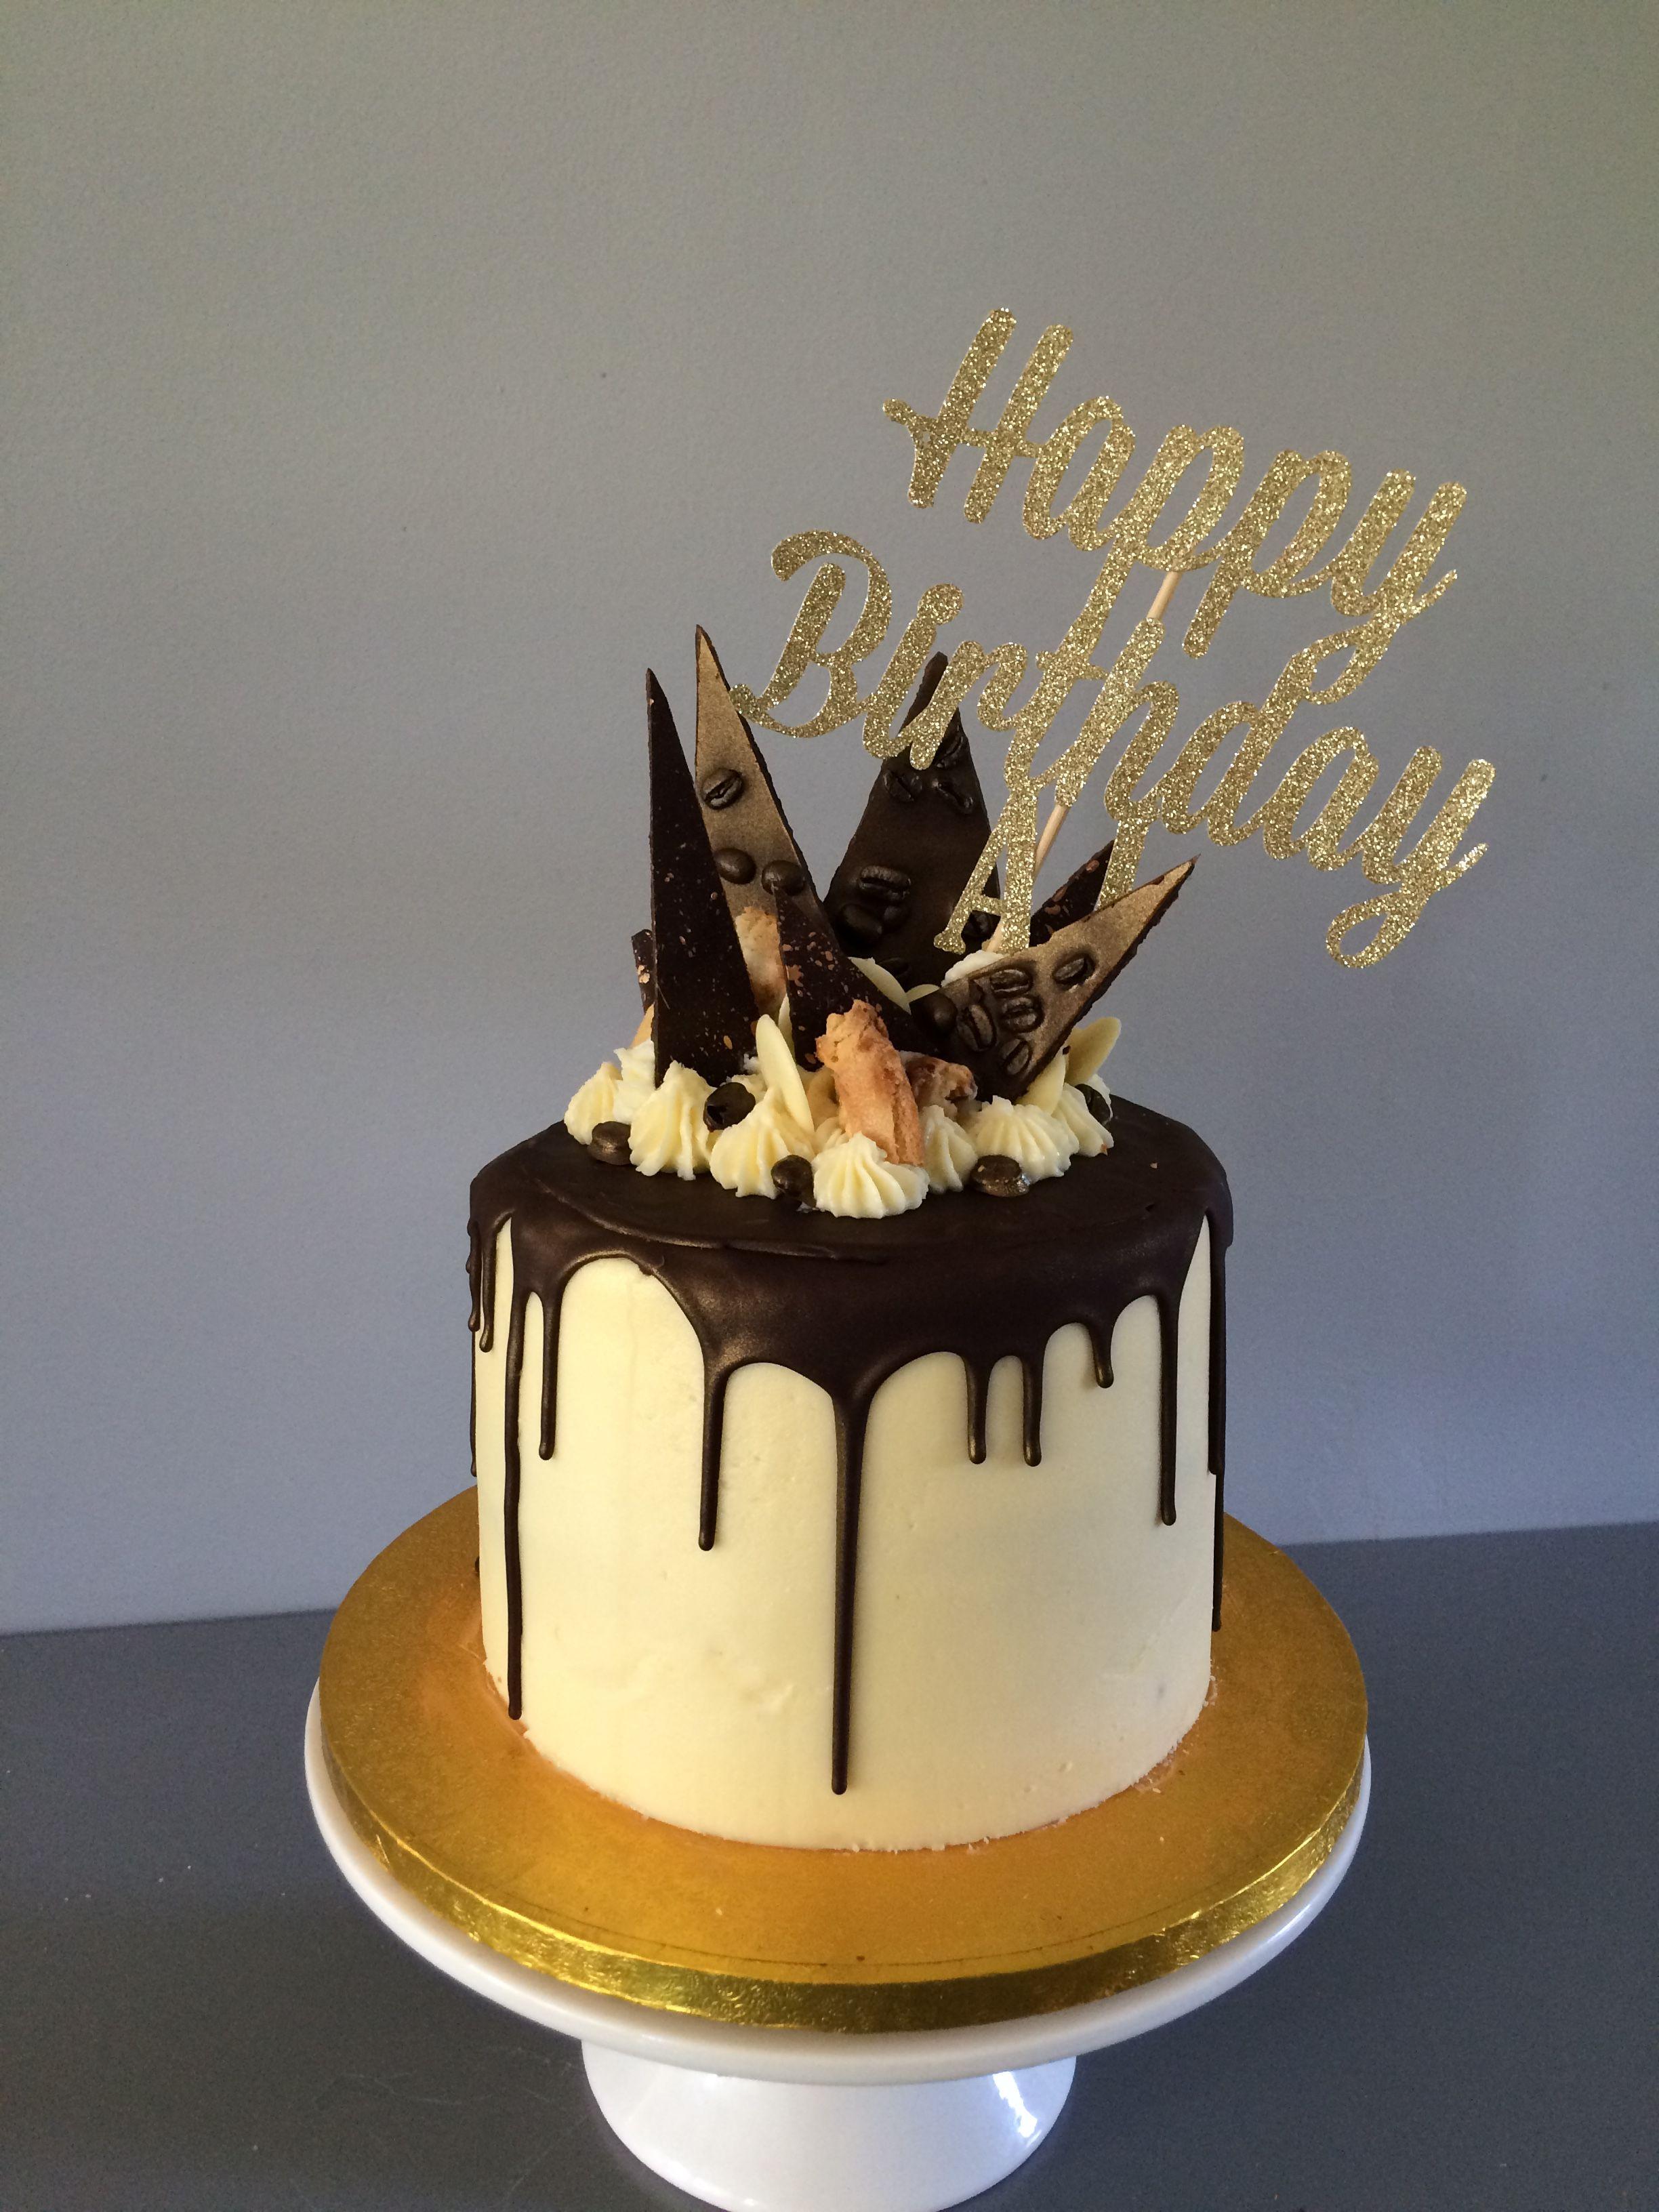 Tiramisu Cake Vanilla Sponge Layers Drizzled With Rum And Espresso Syrup Mascarpone Buttercream Filling